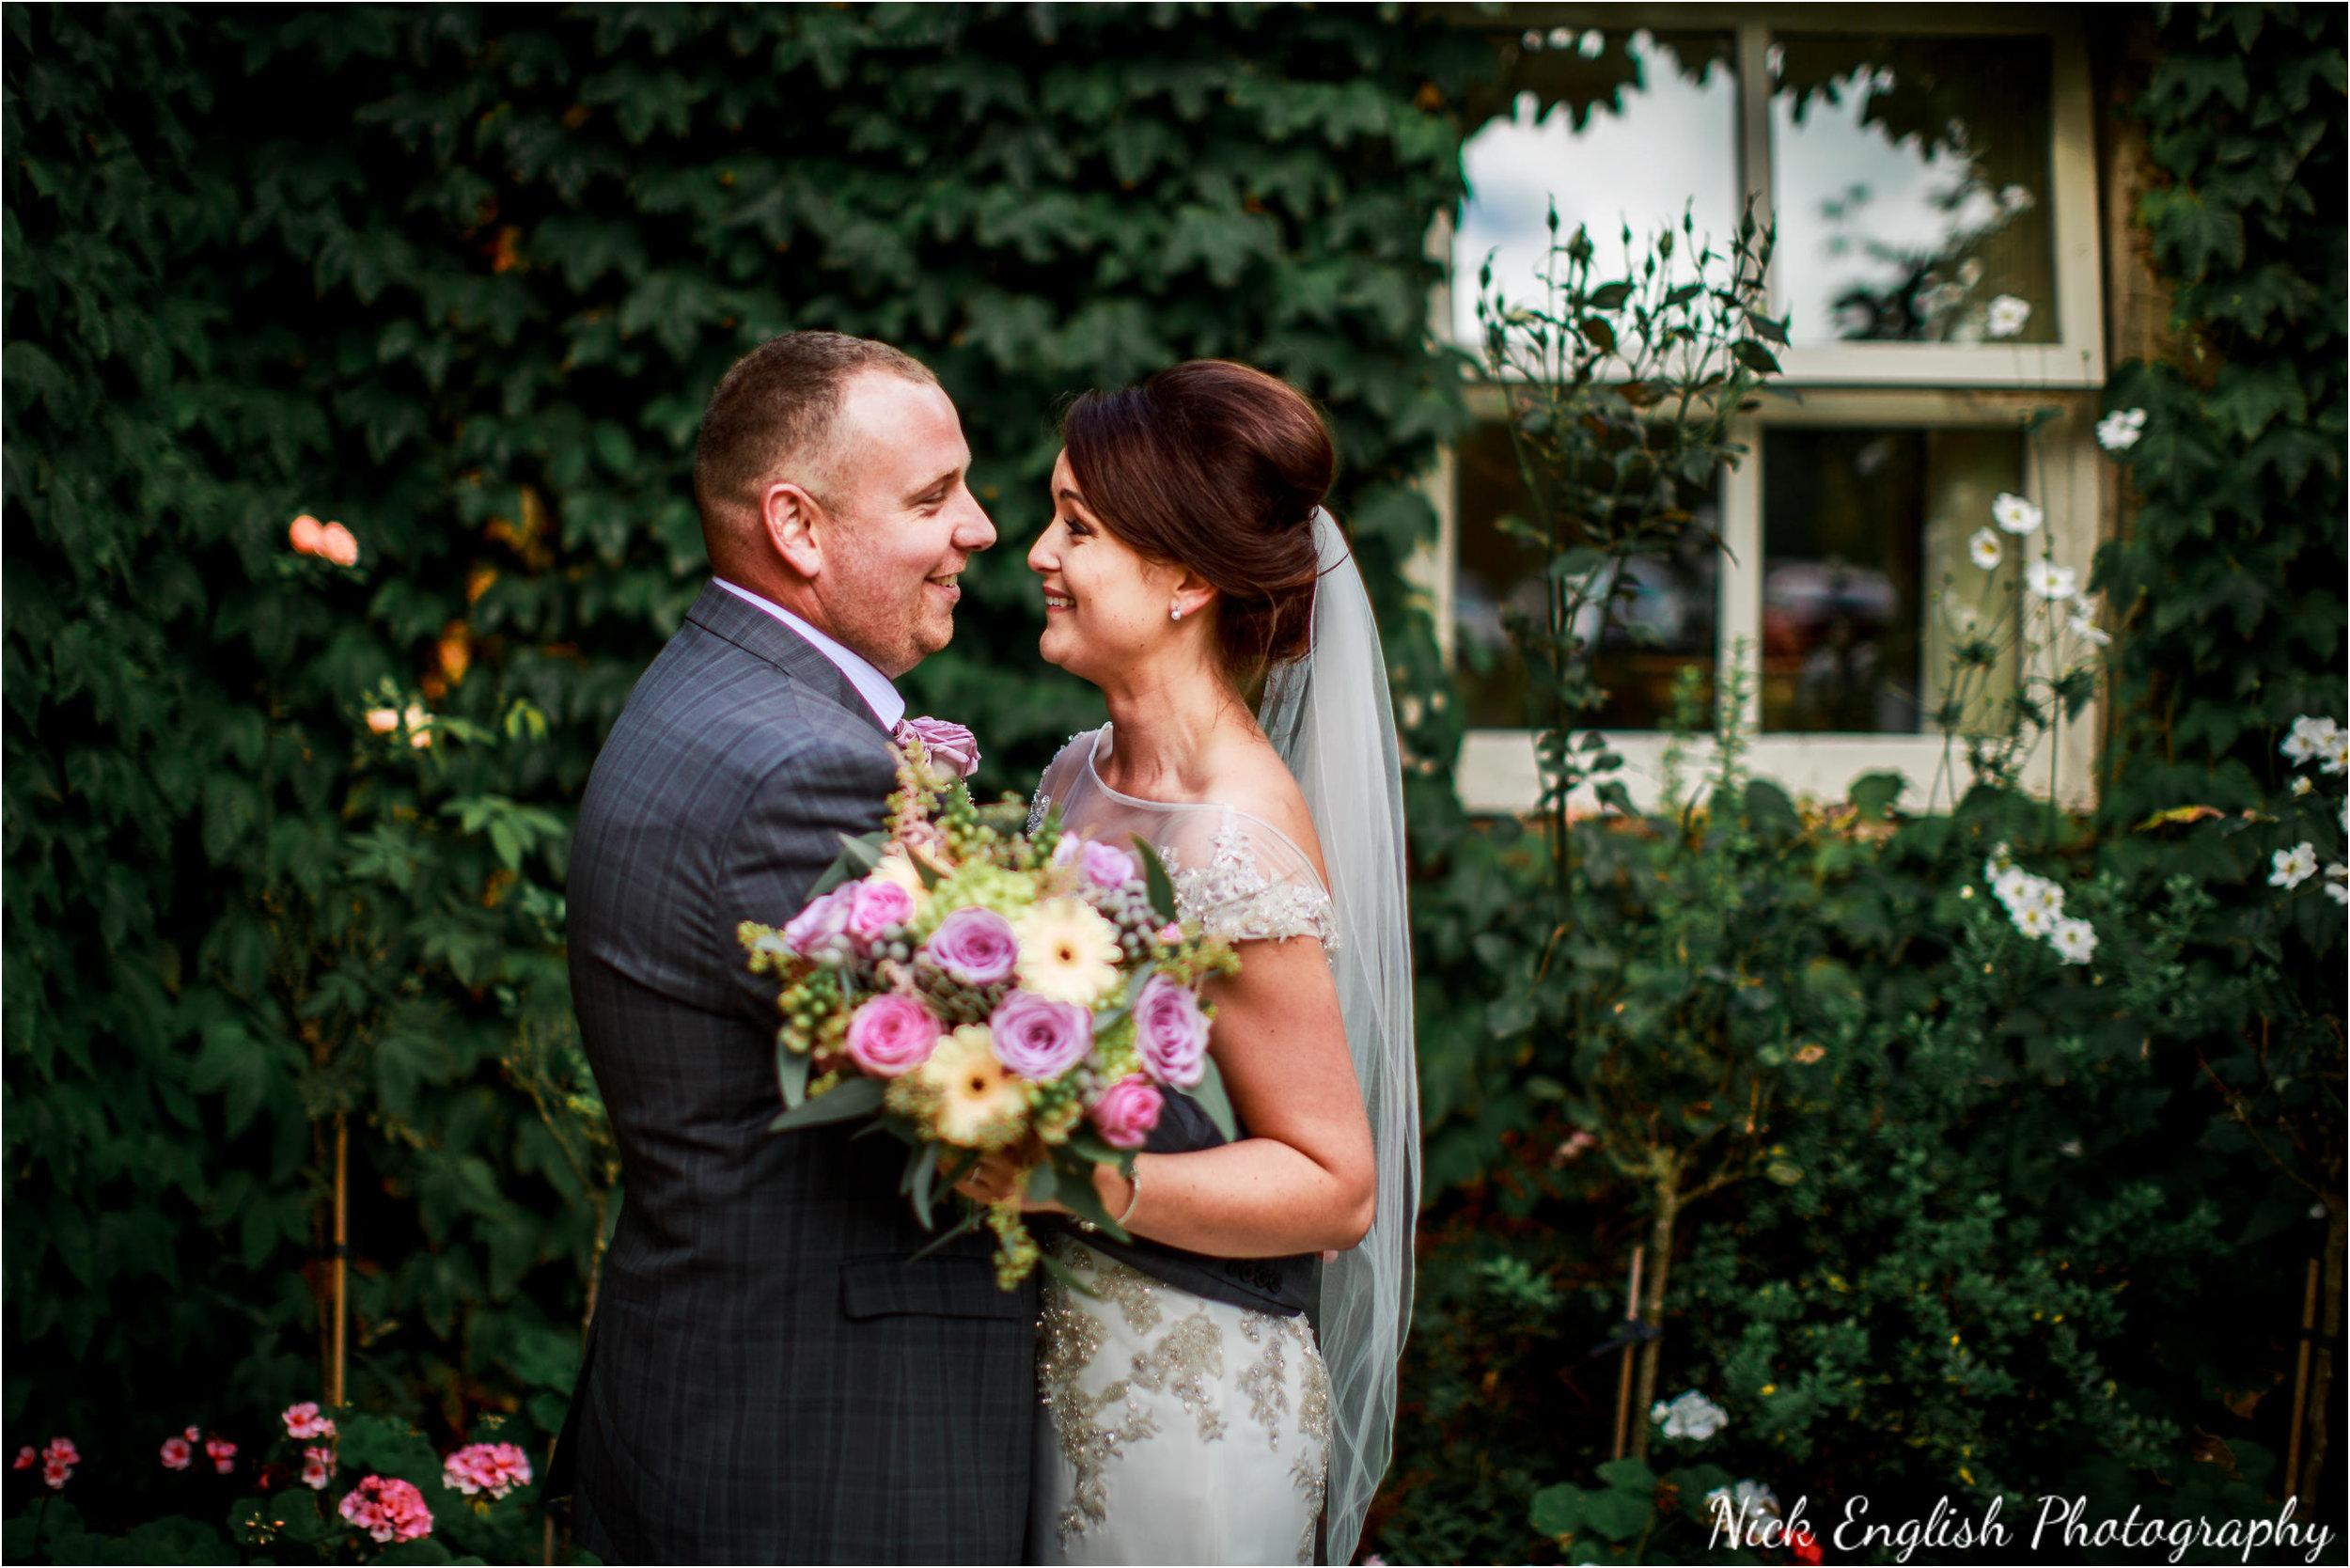 Stacey-Ash-Wedding-Photographs-Stanley-House-Preston-Lancashire-130.jpg